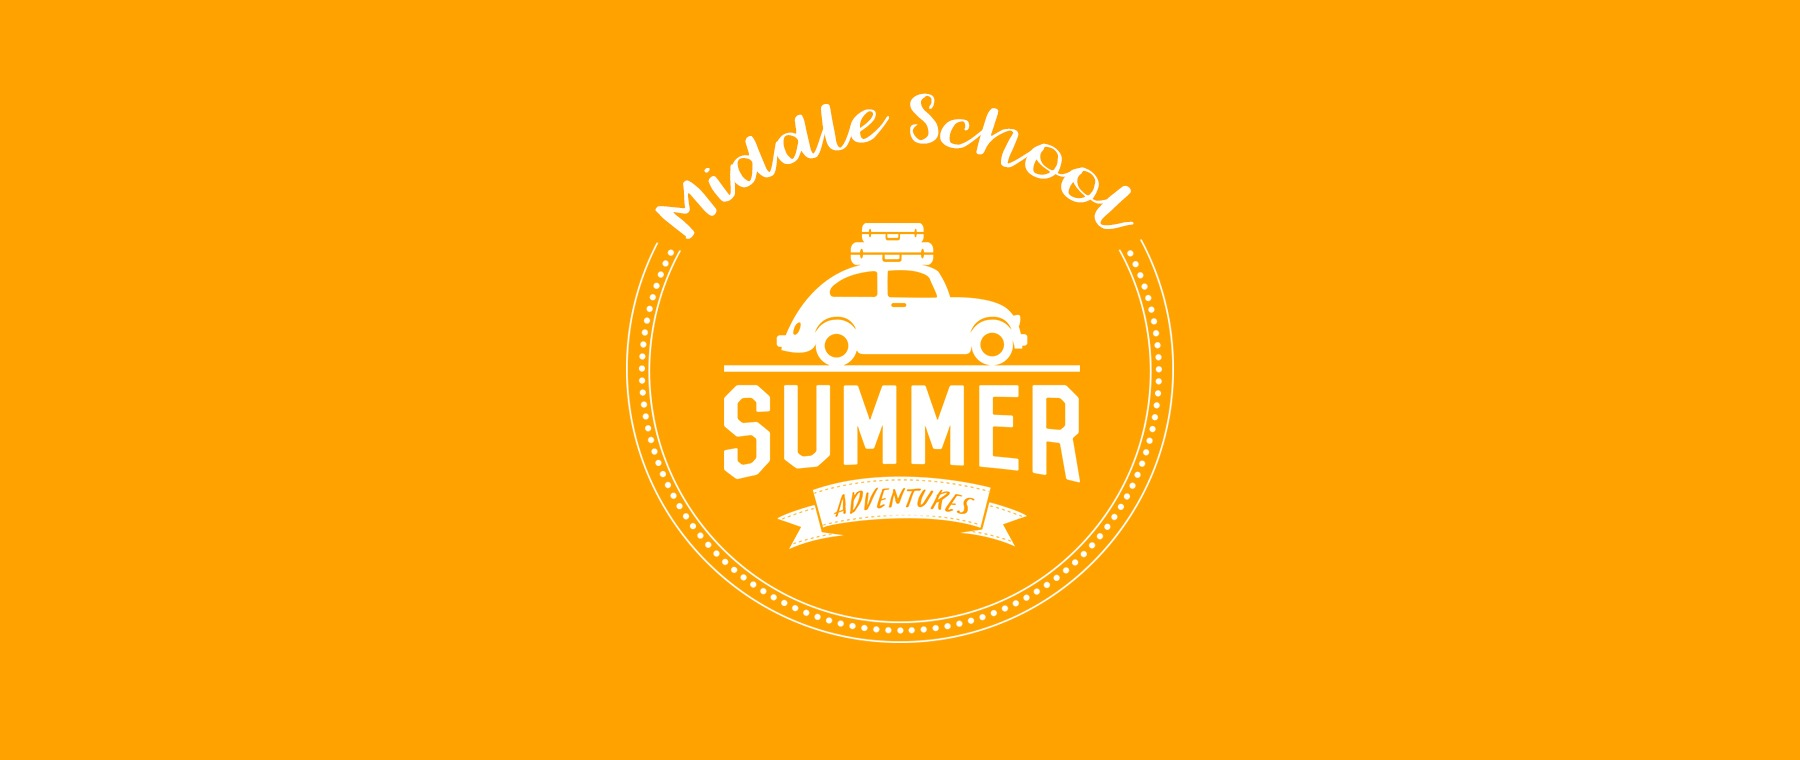 MIddle School Summer